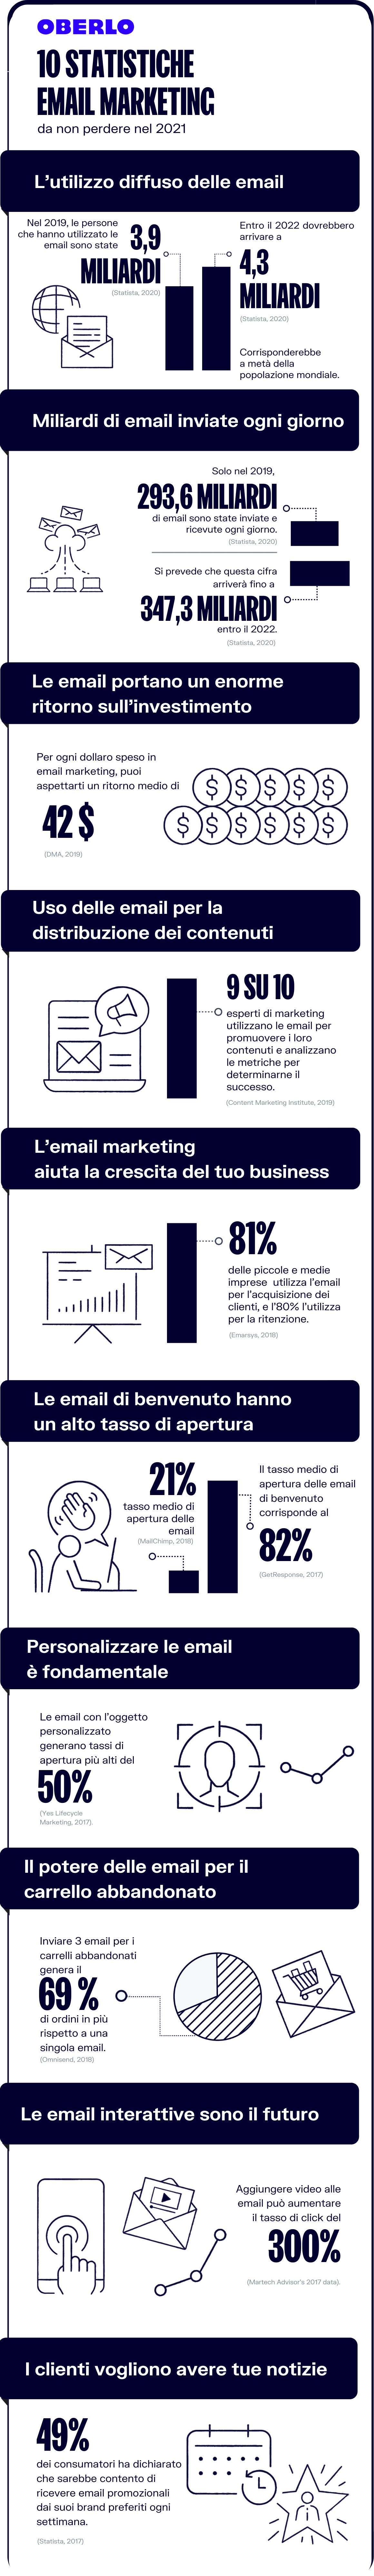 statistiche email marketing 2021 infografica